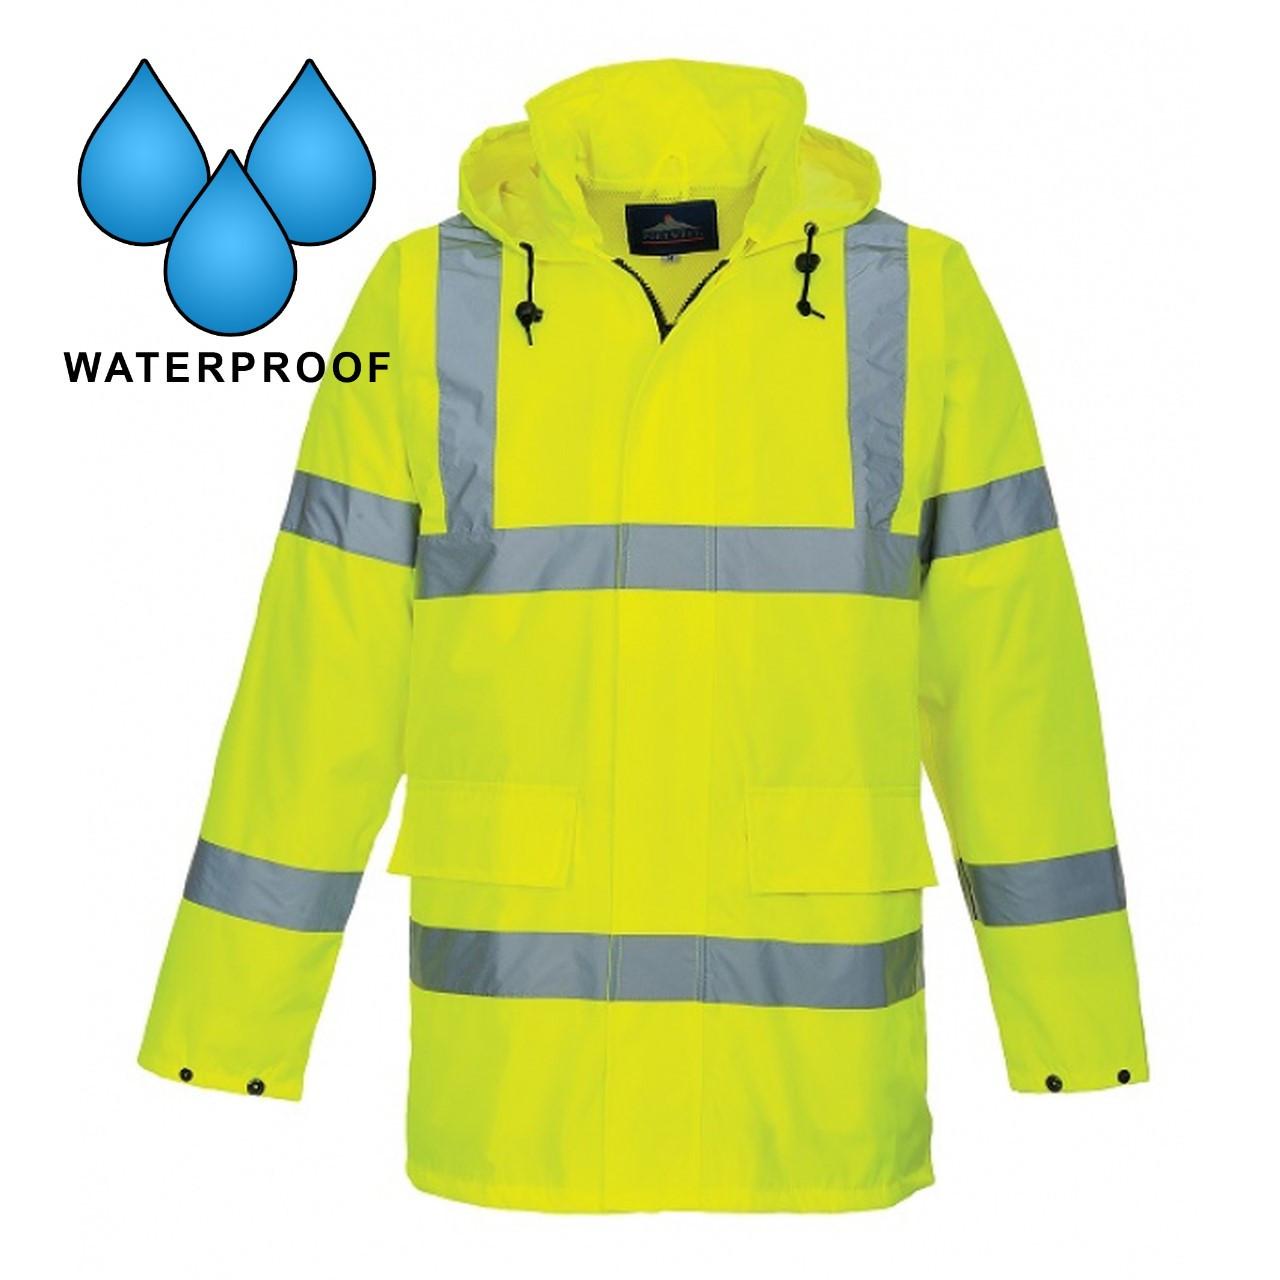 PortWest US160 Class 3 Hi Vis Yellow Waterproof Traffic Jacket